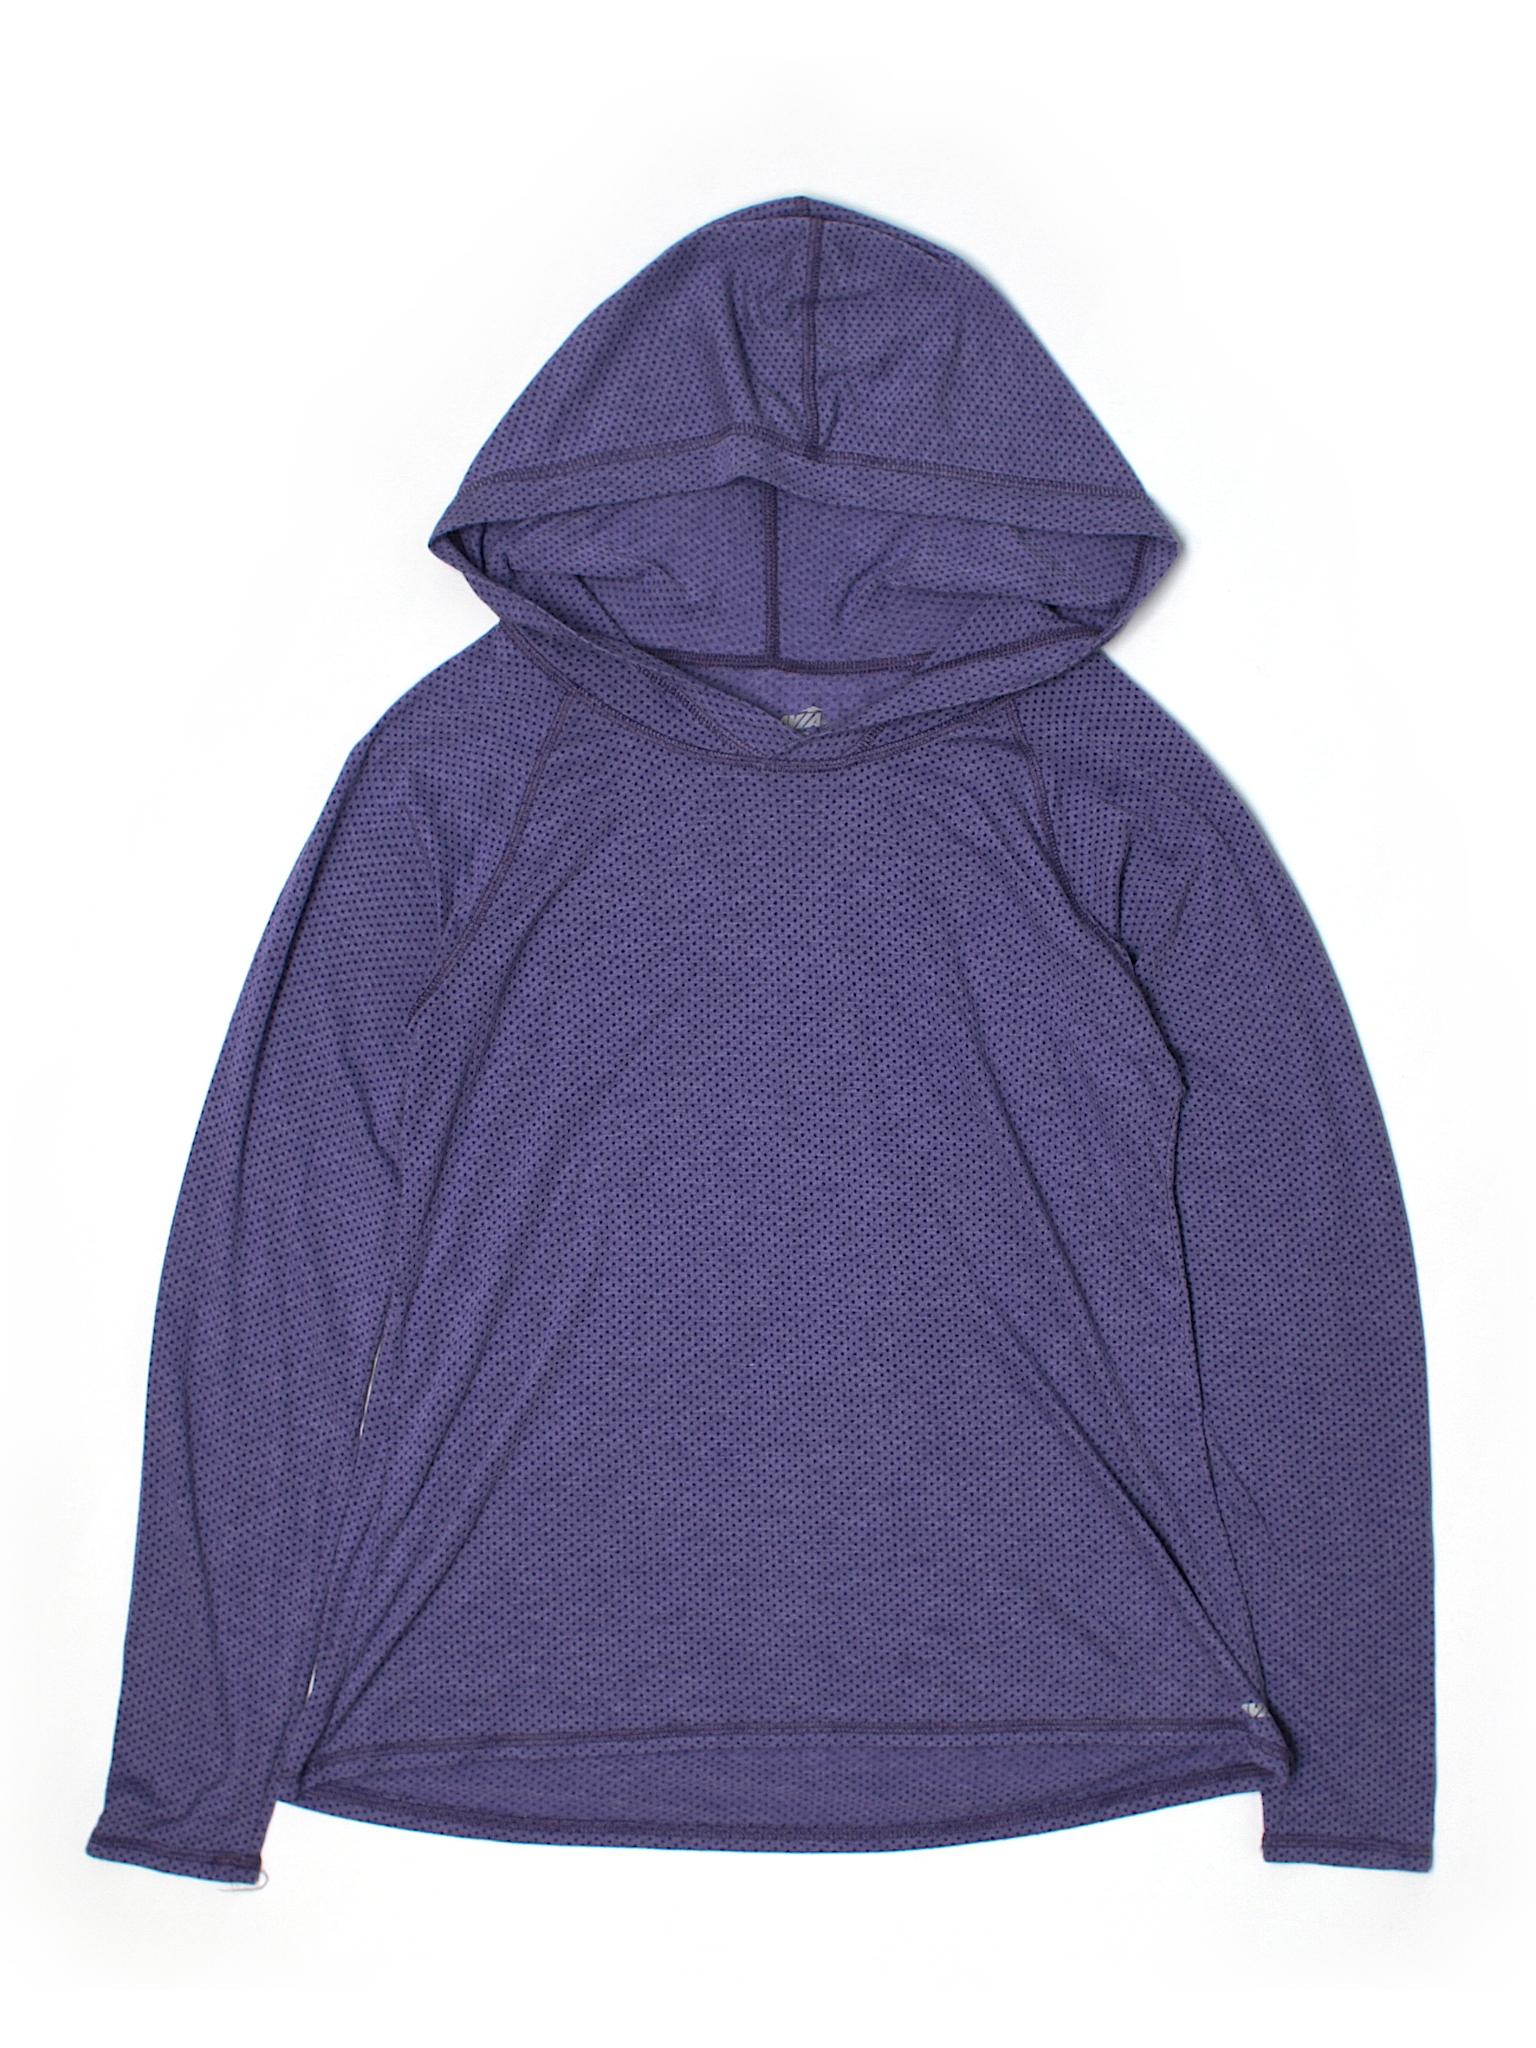 Avia hoodie